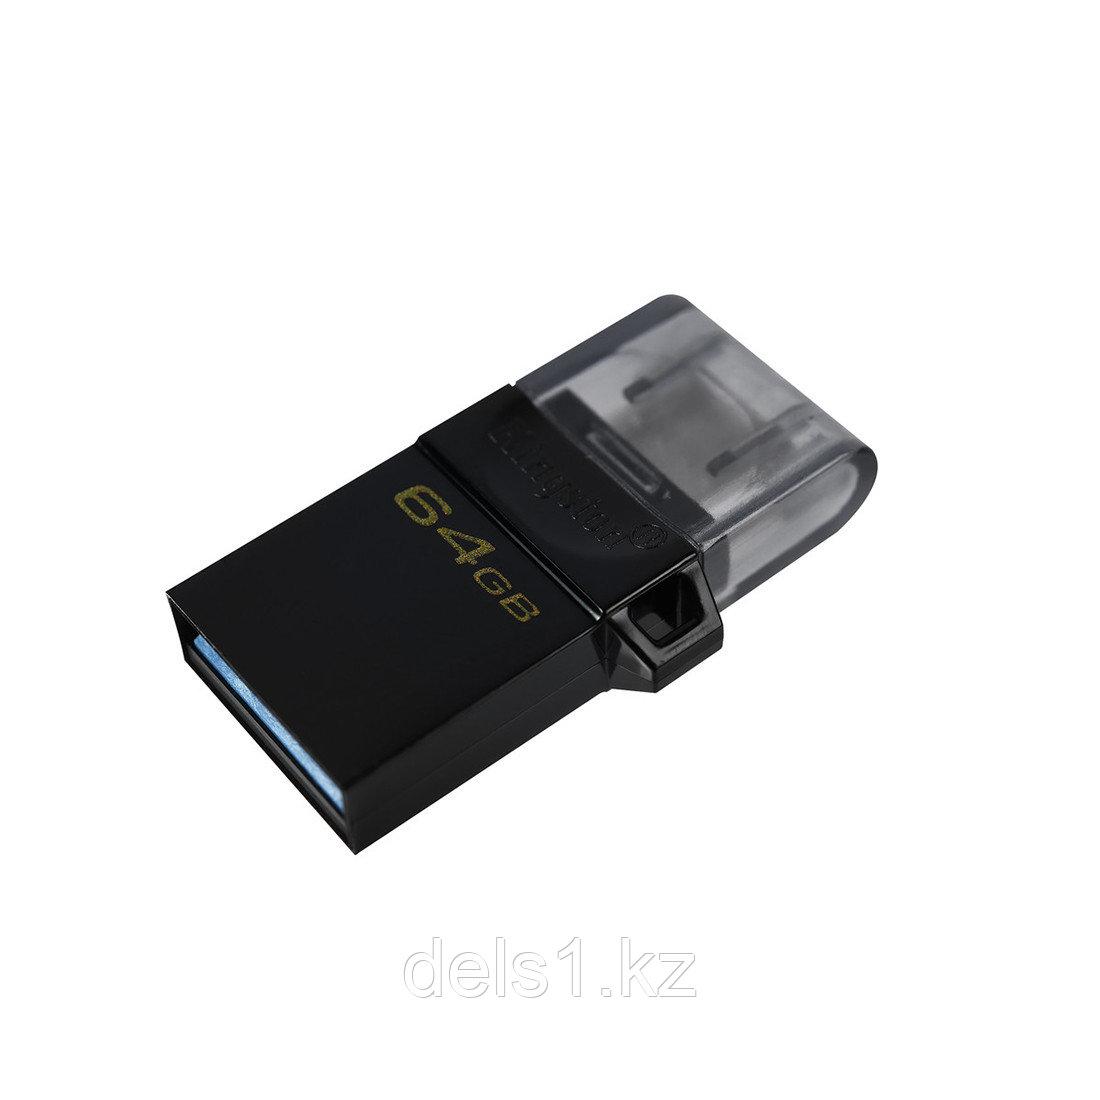 USB-накопитель Kingston DTDUO3G2/64GB 64GB Чёрный